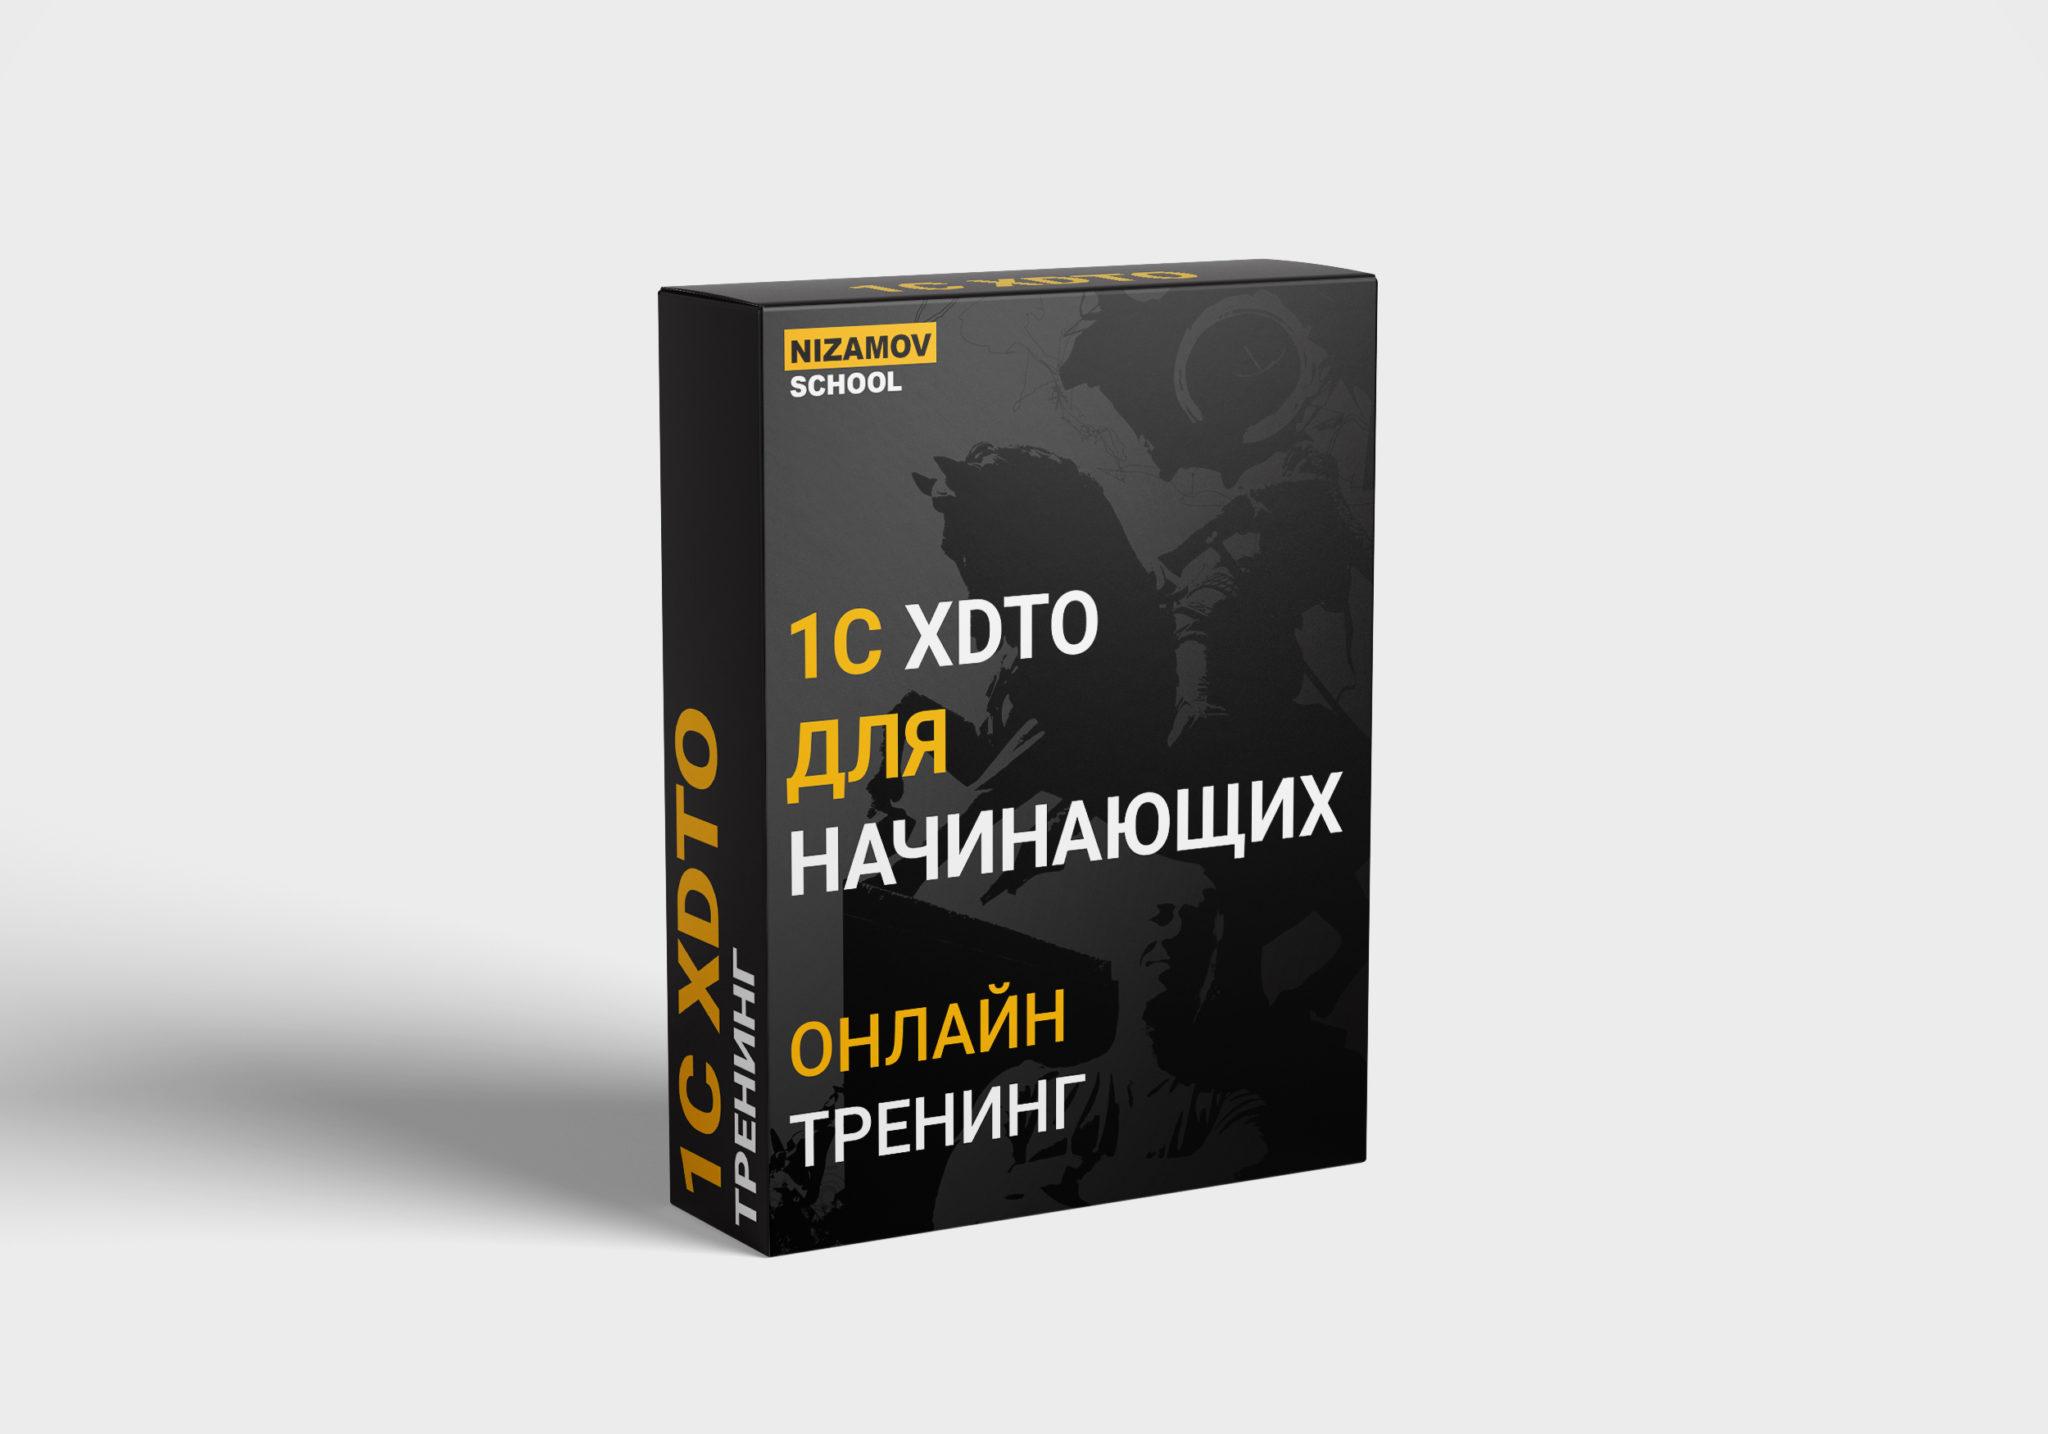 image https://store.turboconf.ru/Content/Files/31C694EEA2260A37464FB9F25FA7B436FB000A06/XDTO-DLYa-NAChINAJuShhIH-2048x1434.jpg